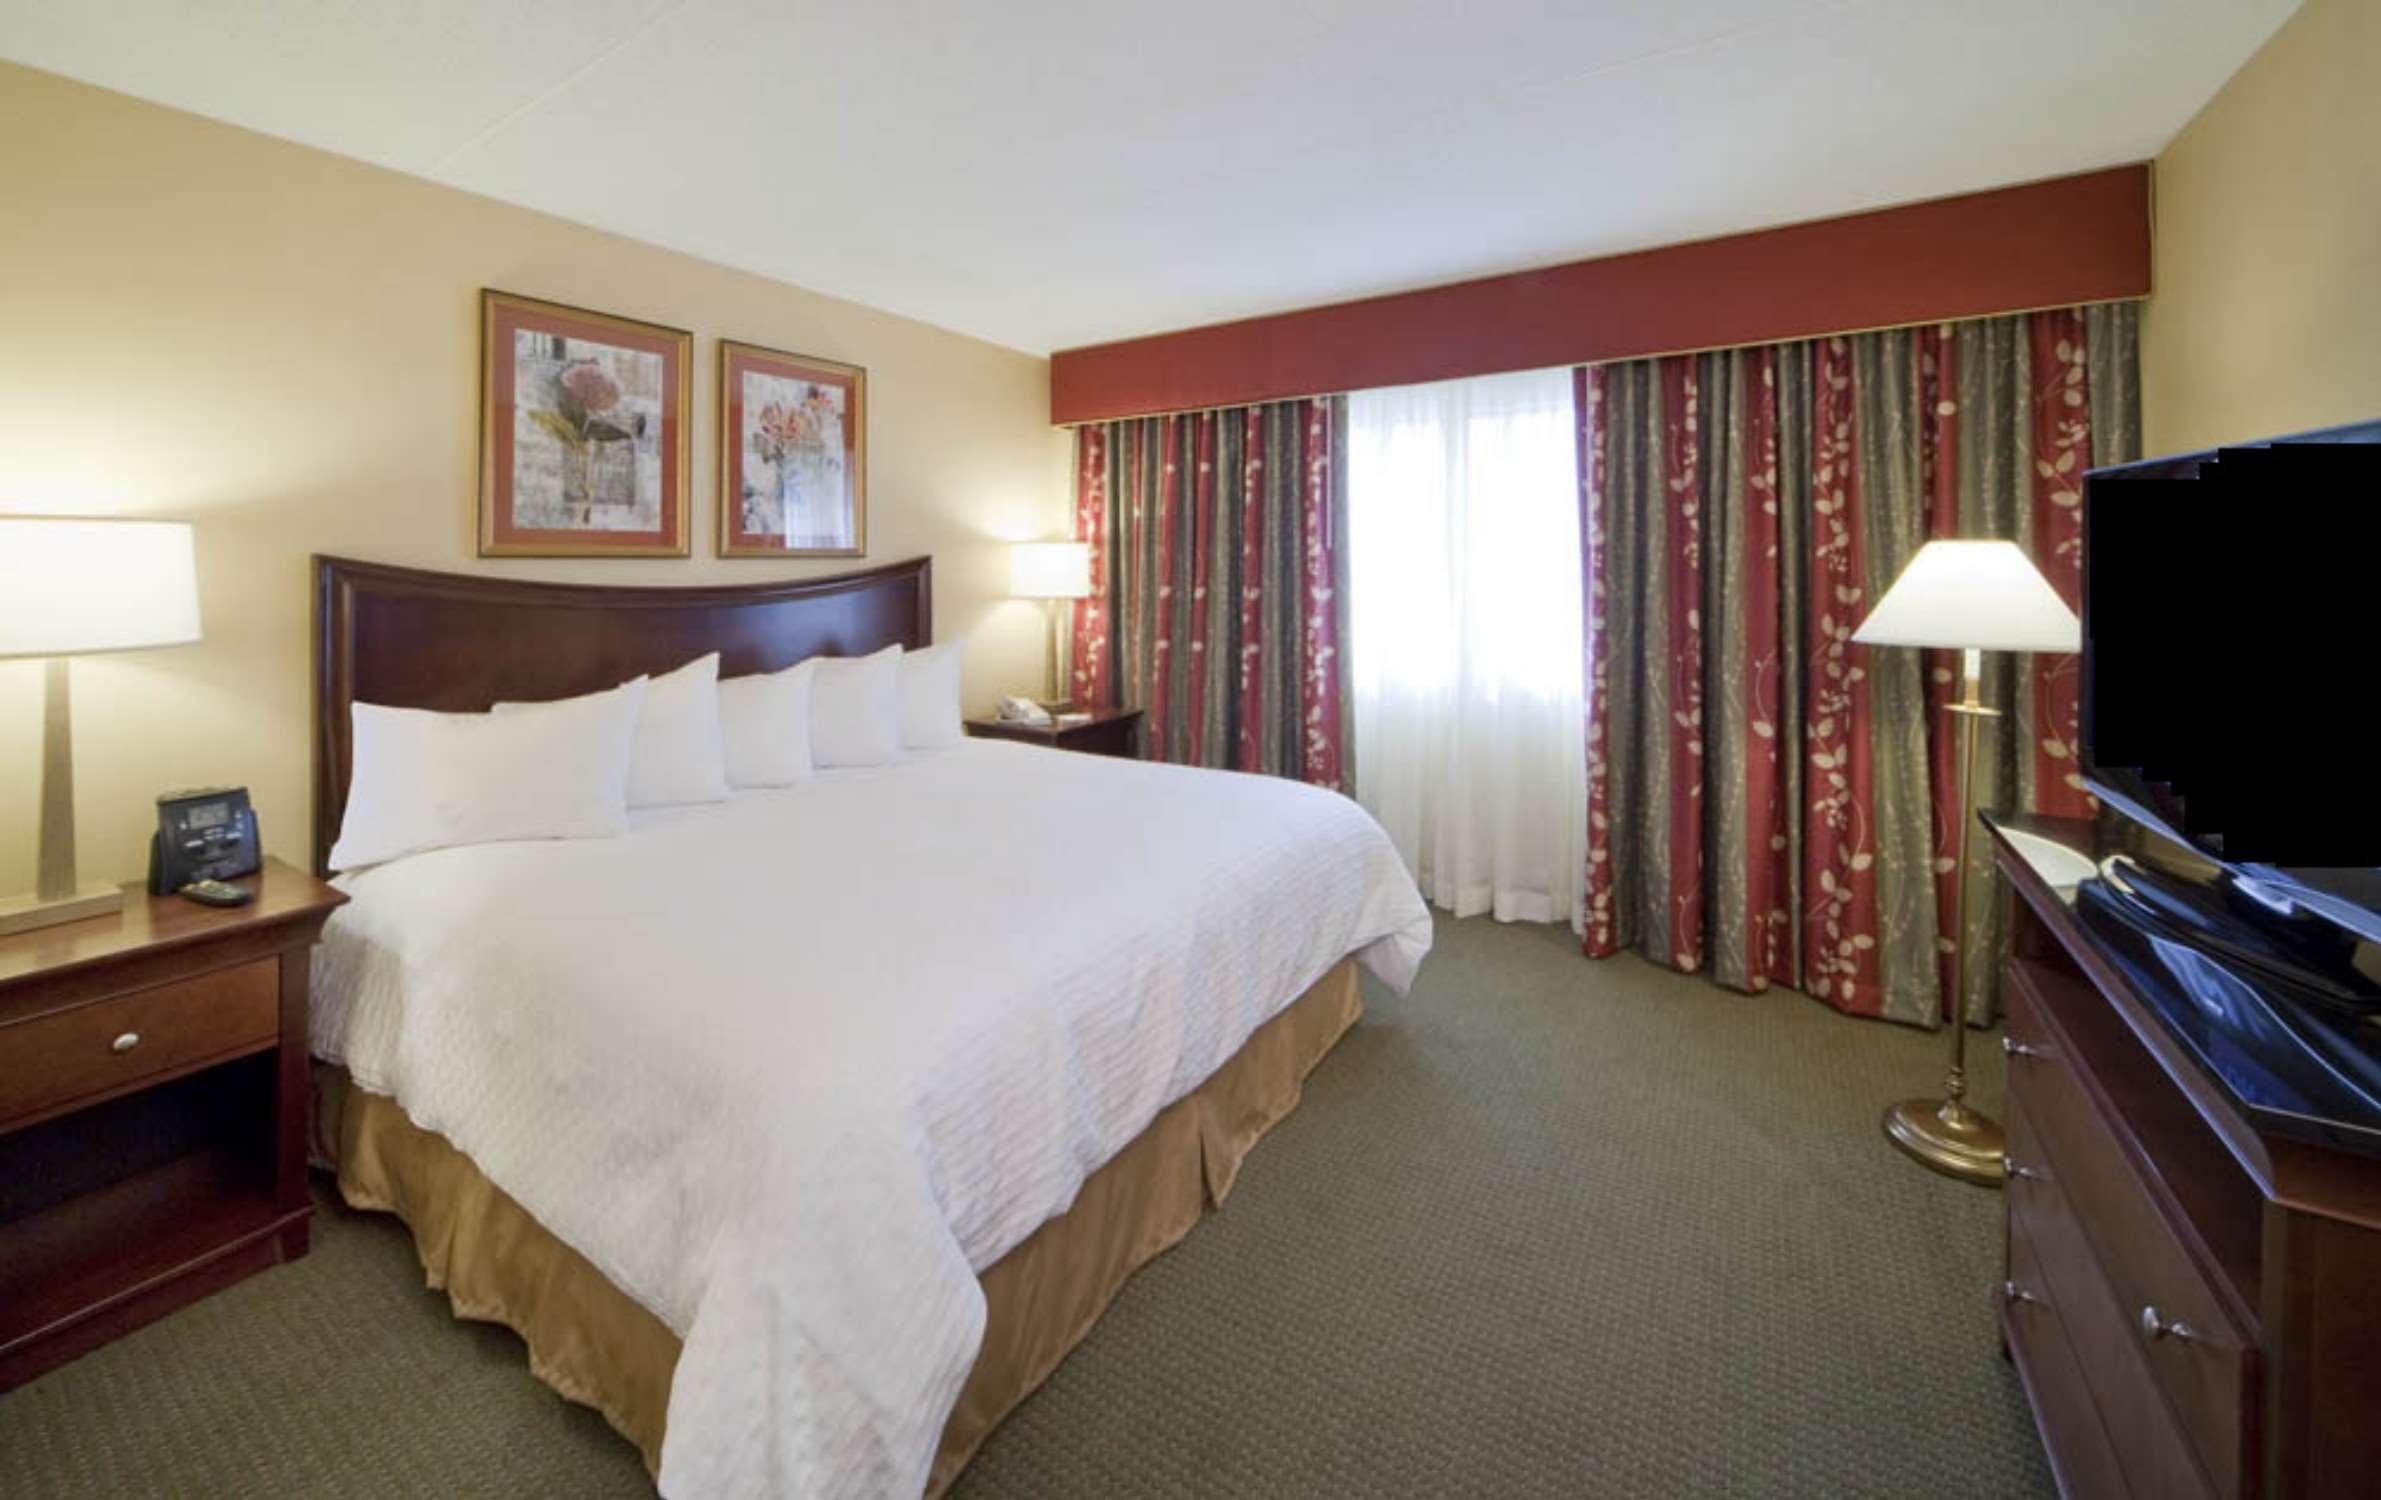 Hampton Inn & Suites Orlando-John Young Pkwy/S. Park